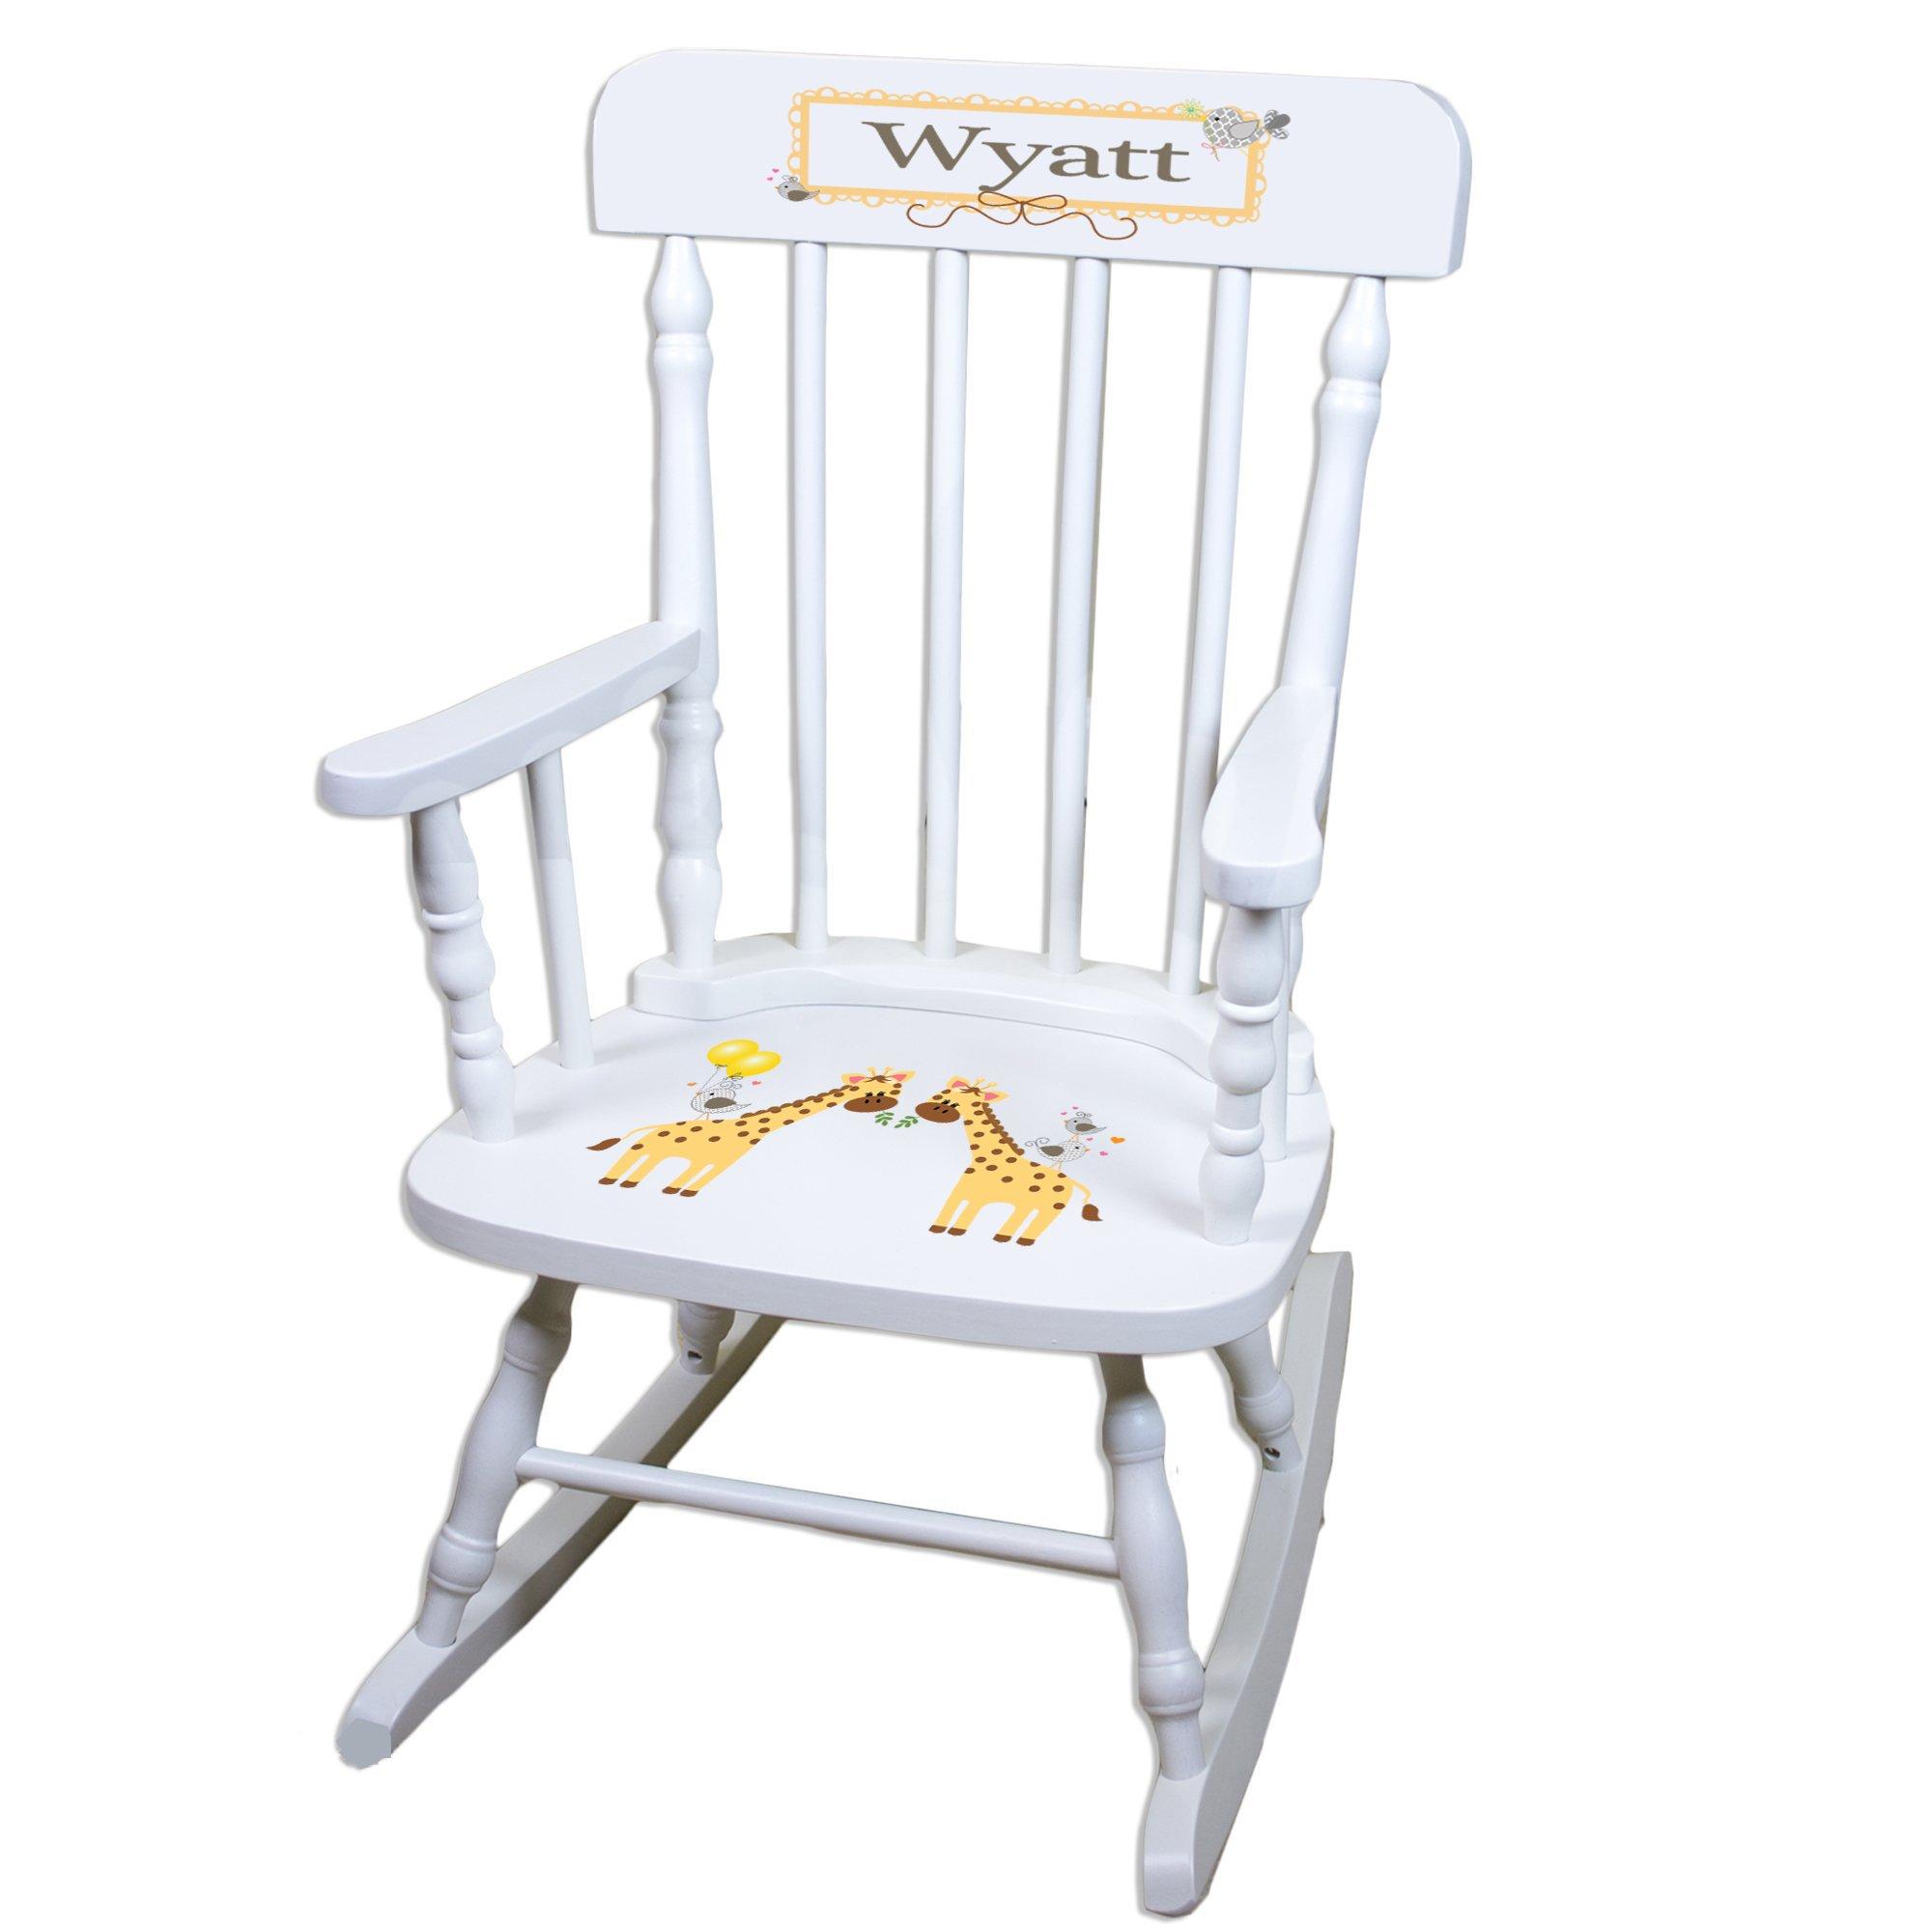 Personalized Giraffe White Childrens Rocking Chair